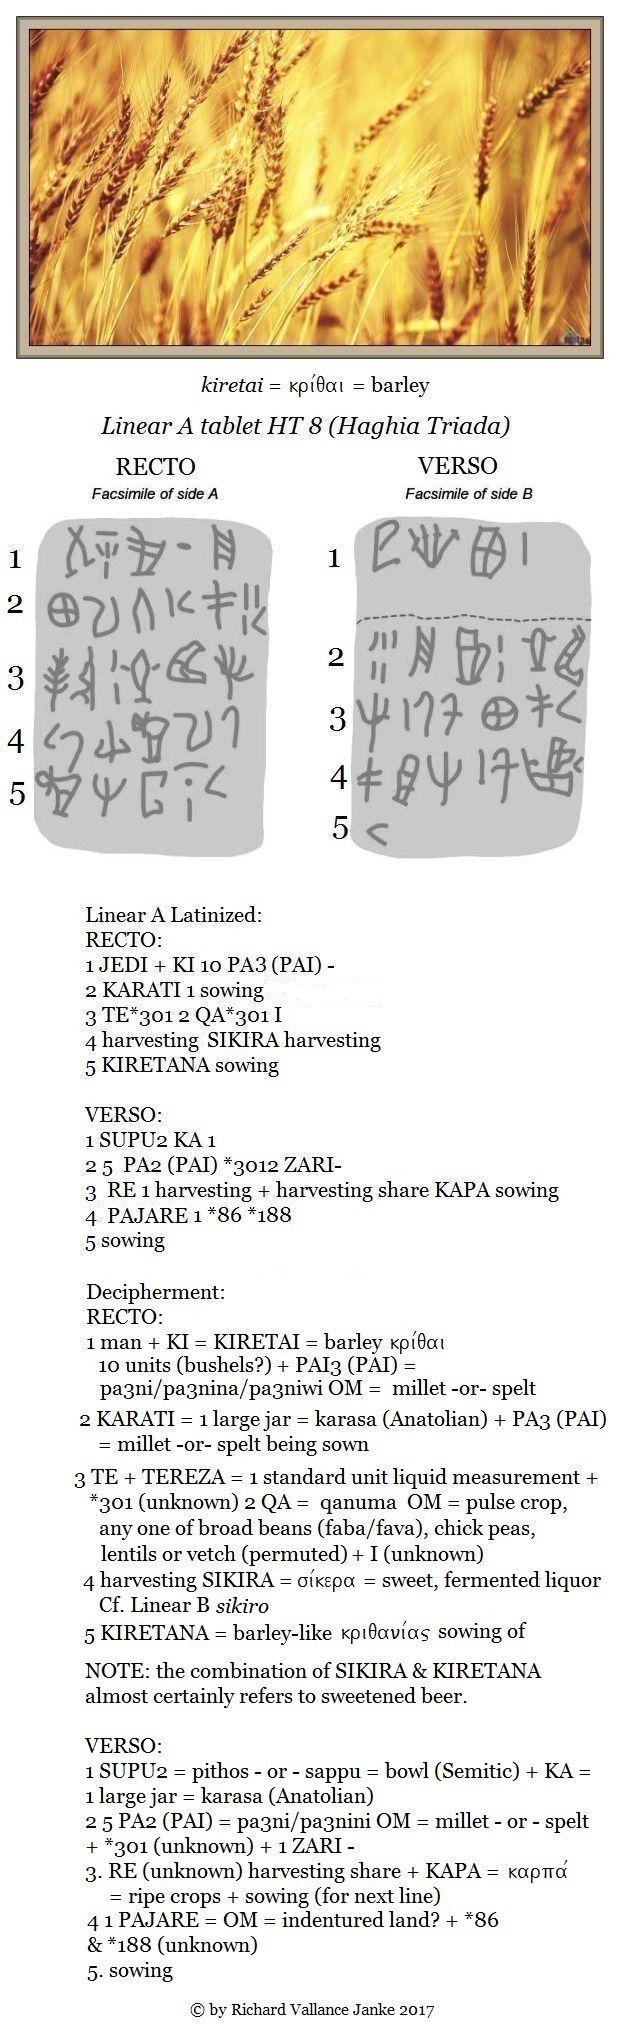 Linear A tablet HT 8